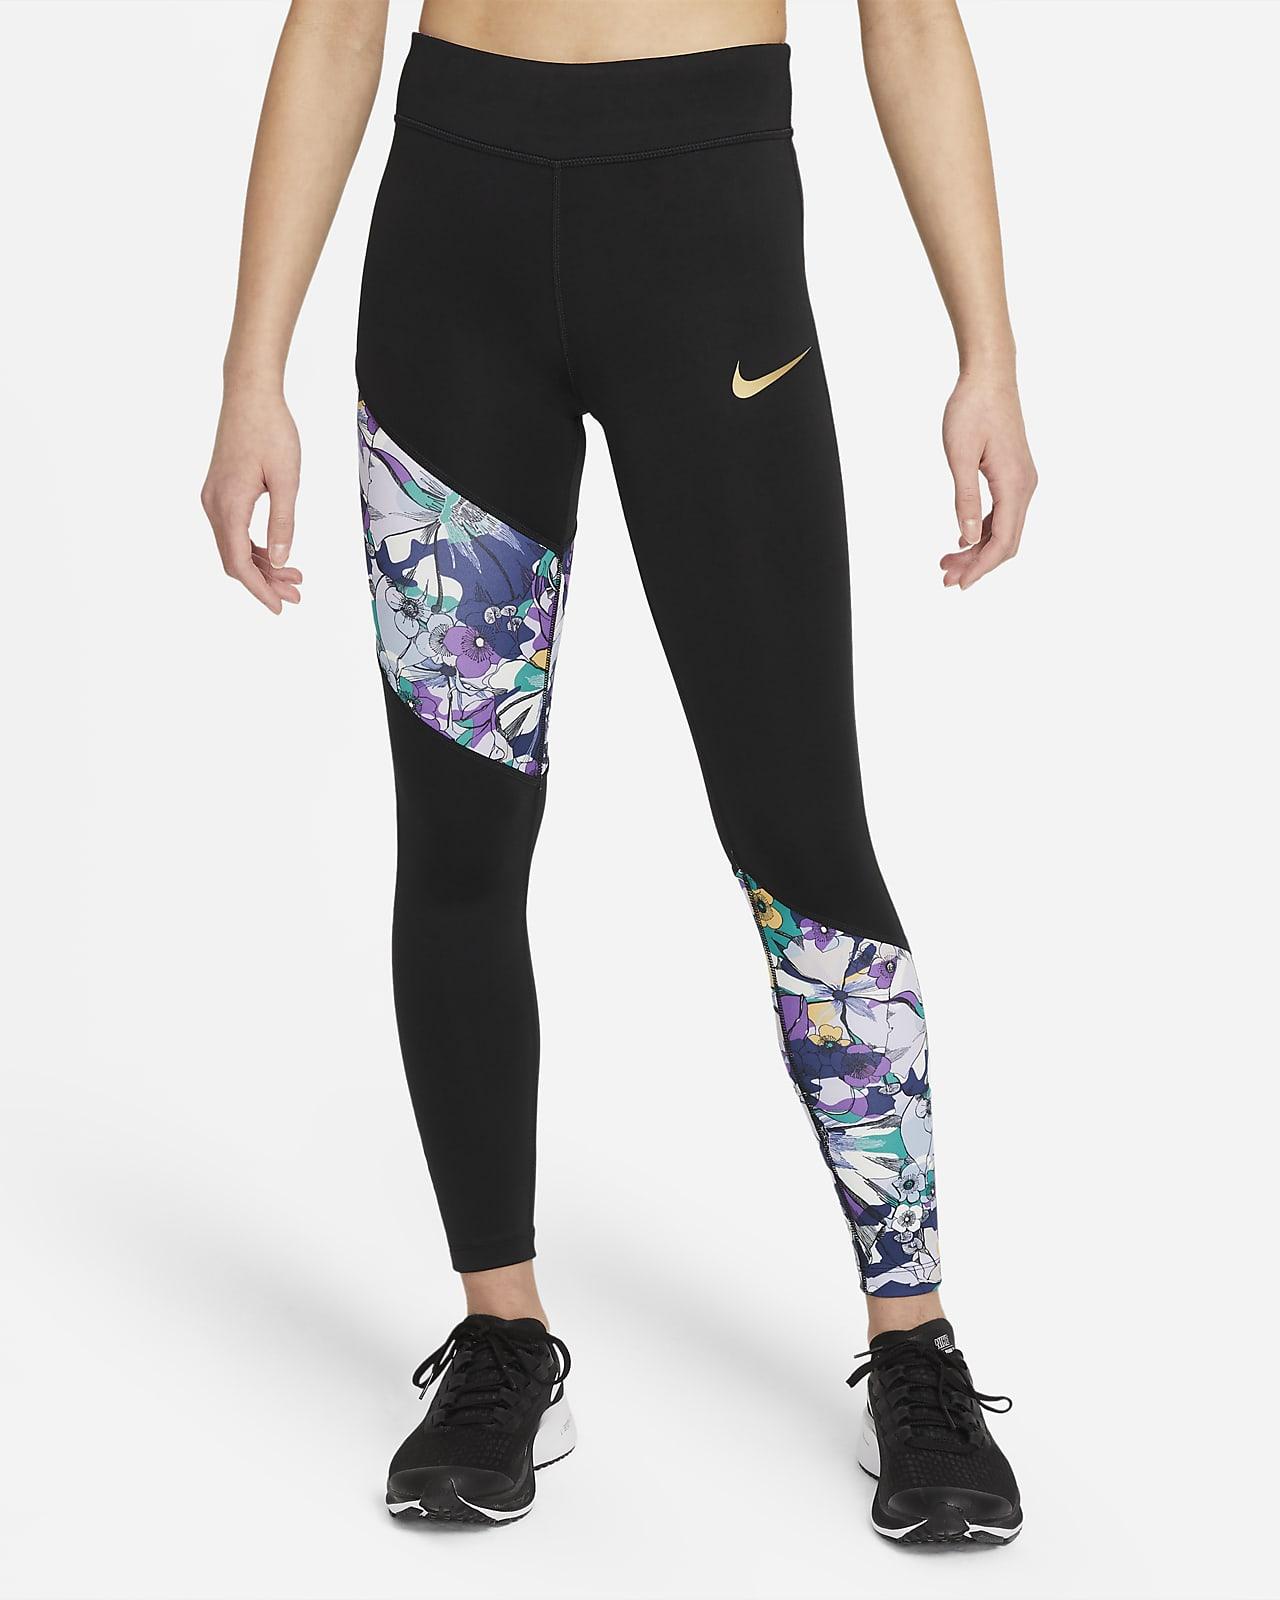 Nike Dri-FIT One Leggings - Nena